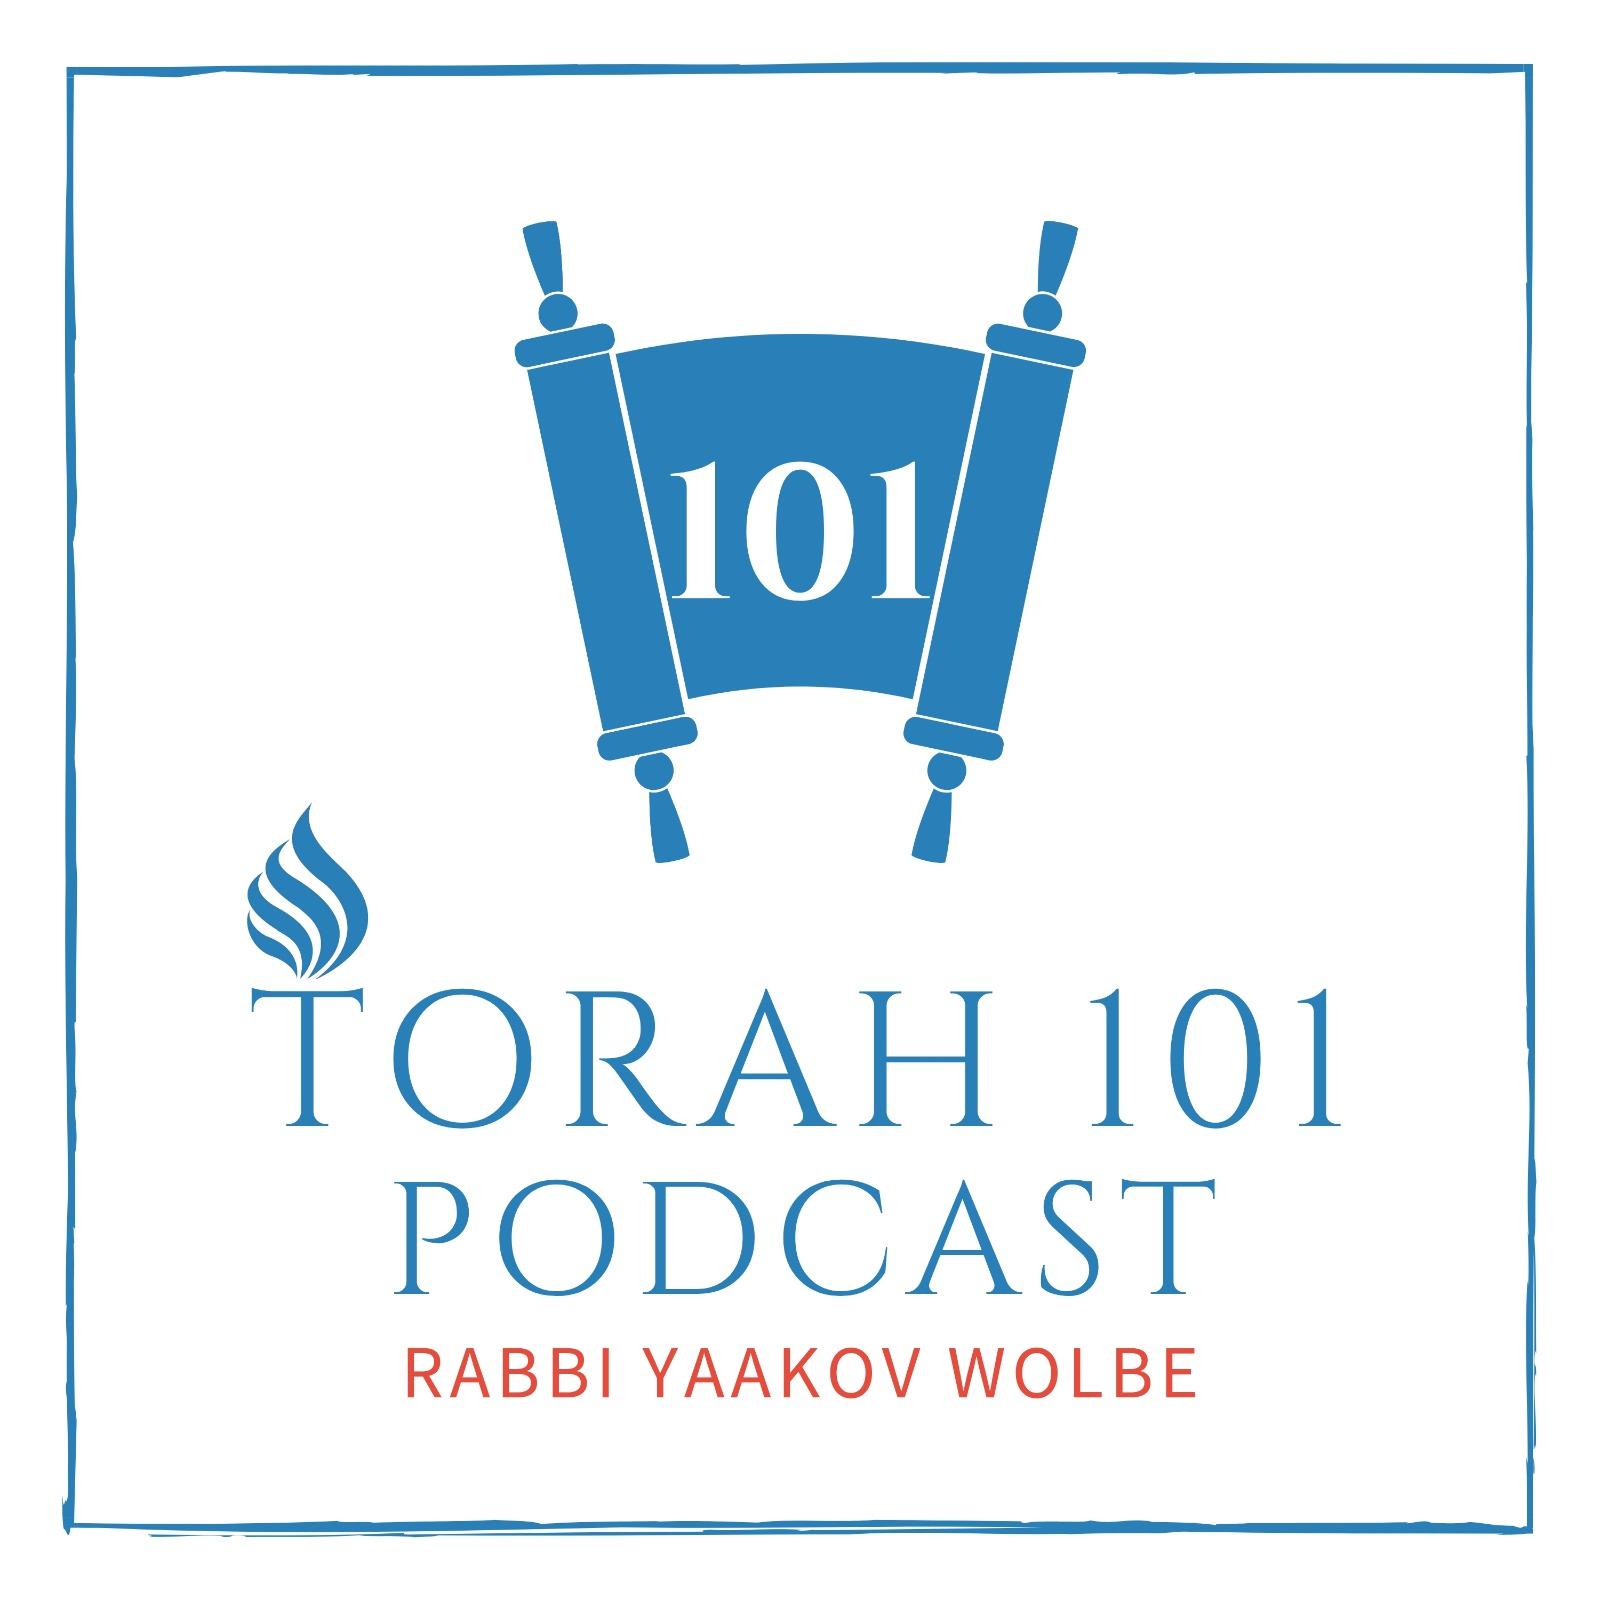 Free Torah Download Pdfthe Conversation Podcast!